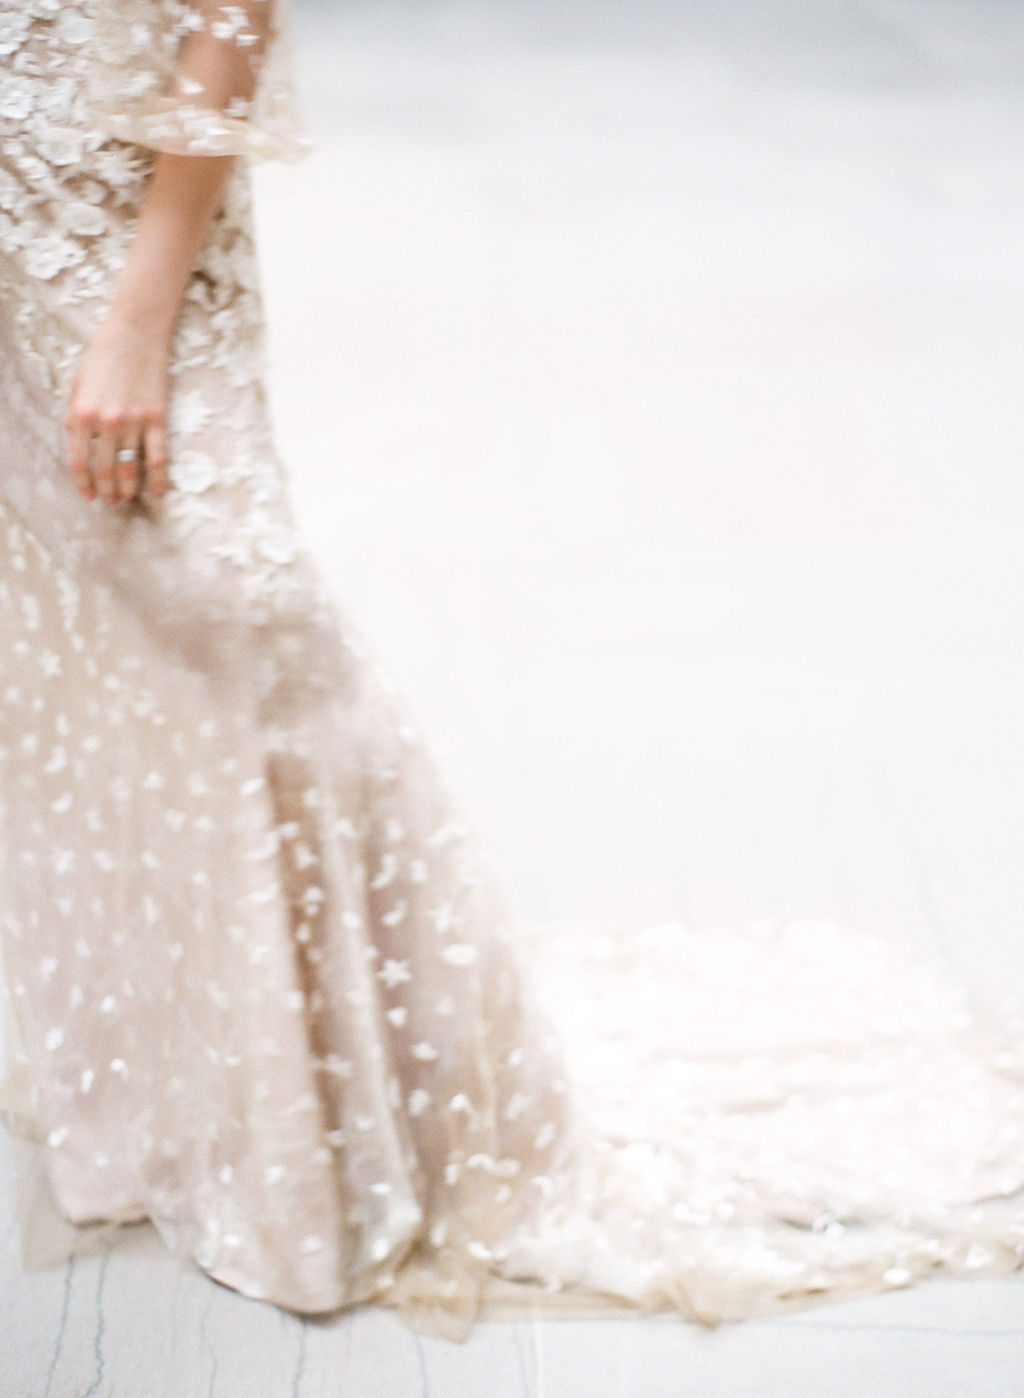 artiese-ago-wedding-editorial-000423620001.jpg